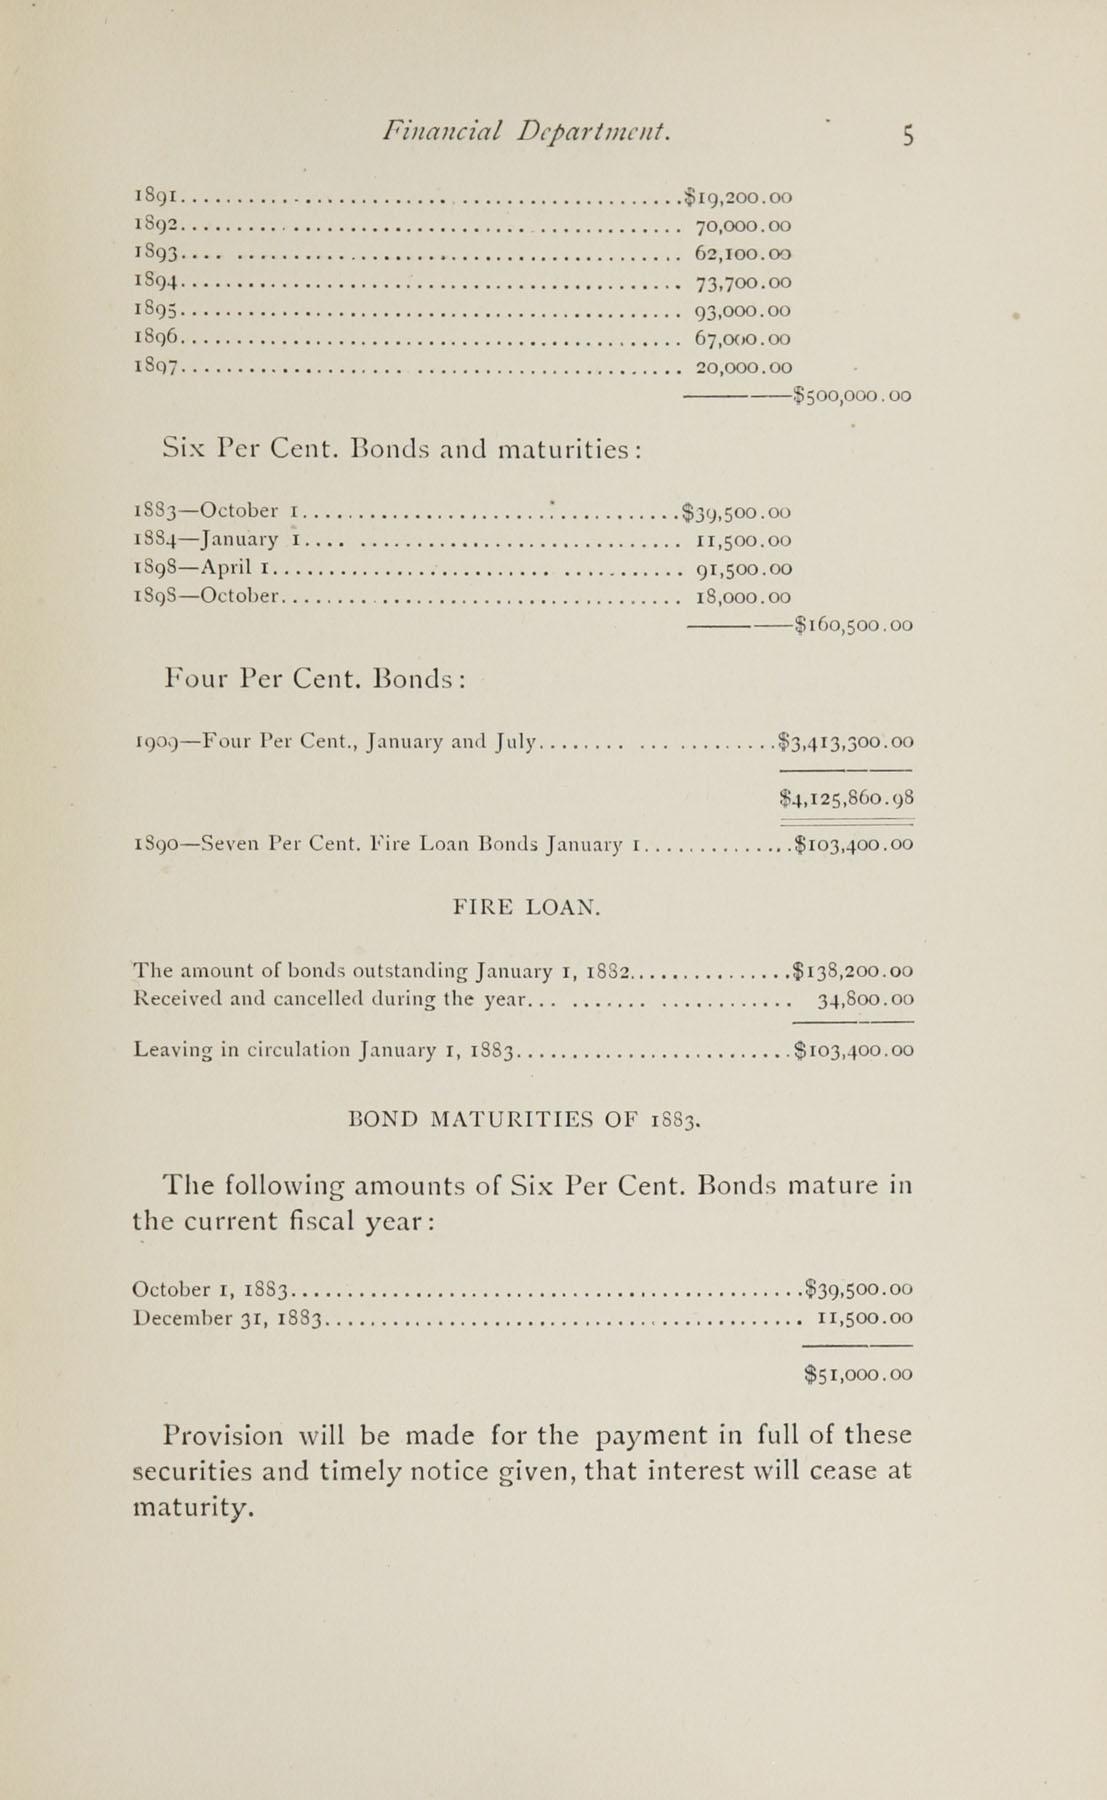 Charleston Yearbook, 1882, page 5